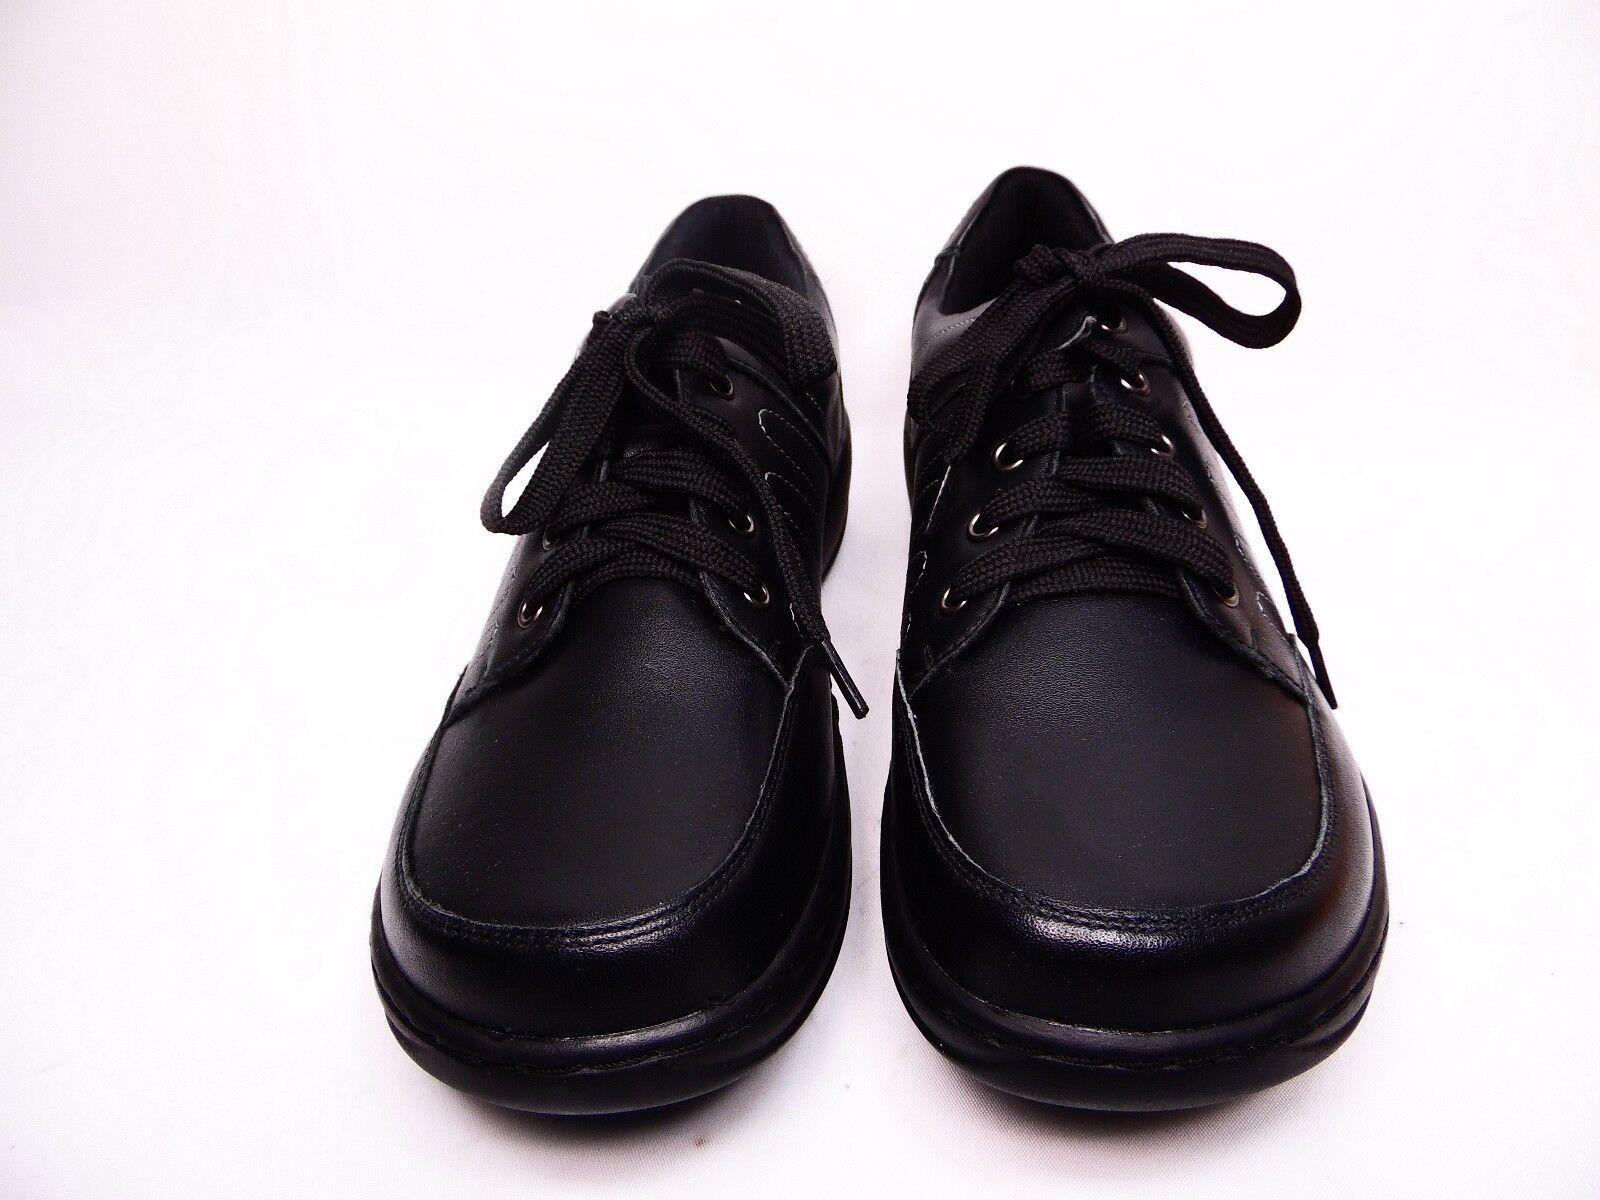 Spring Step Professional Veri Work Women's Shoes, Black, 8.5 W US